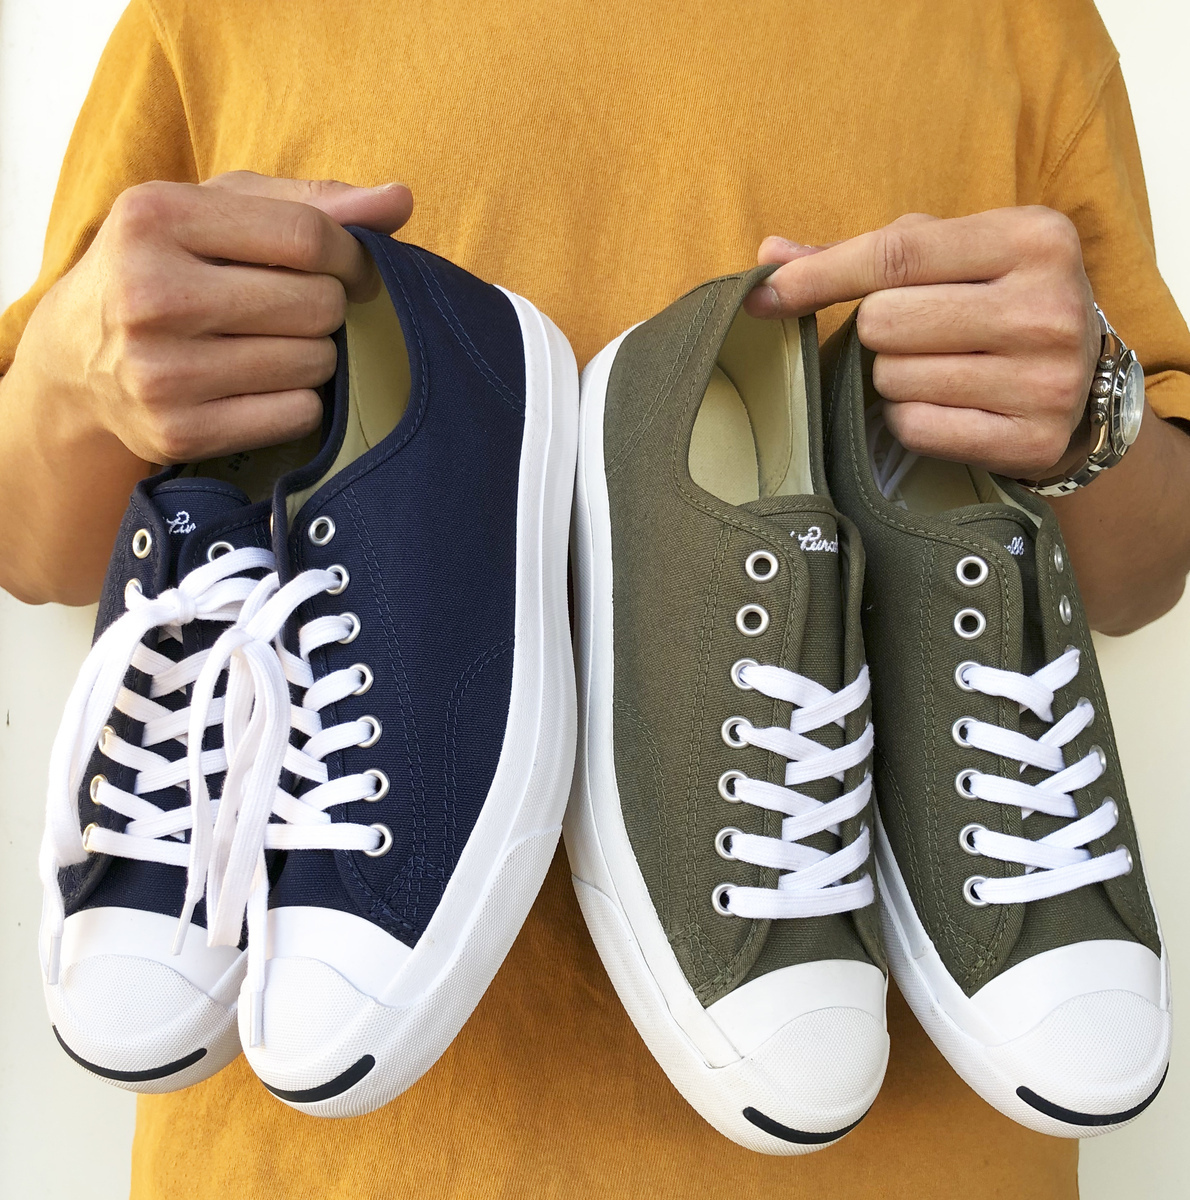 Converse匡威 军绿草绿墨绿色午夜蓝低帮男女帆布鞋开口笑 157785